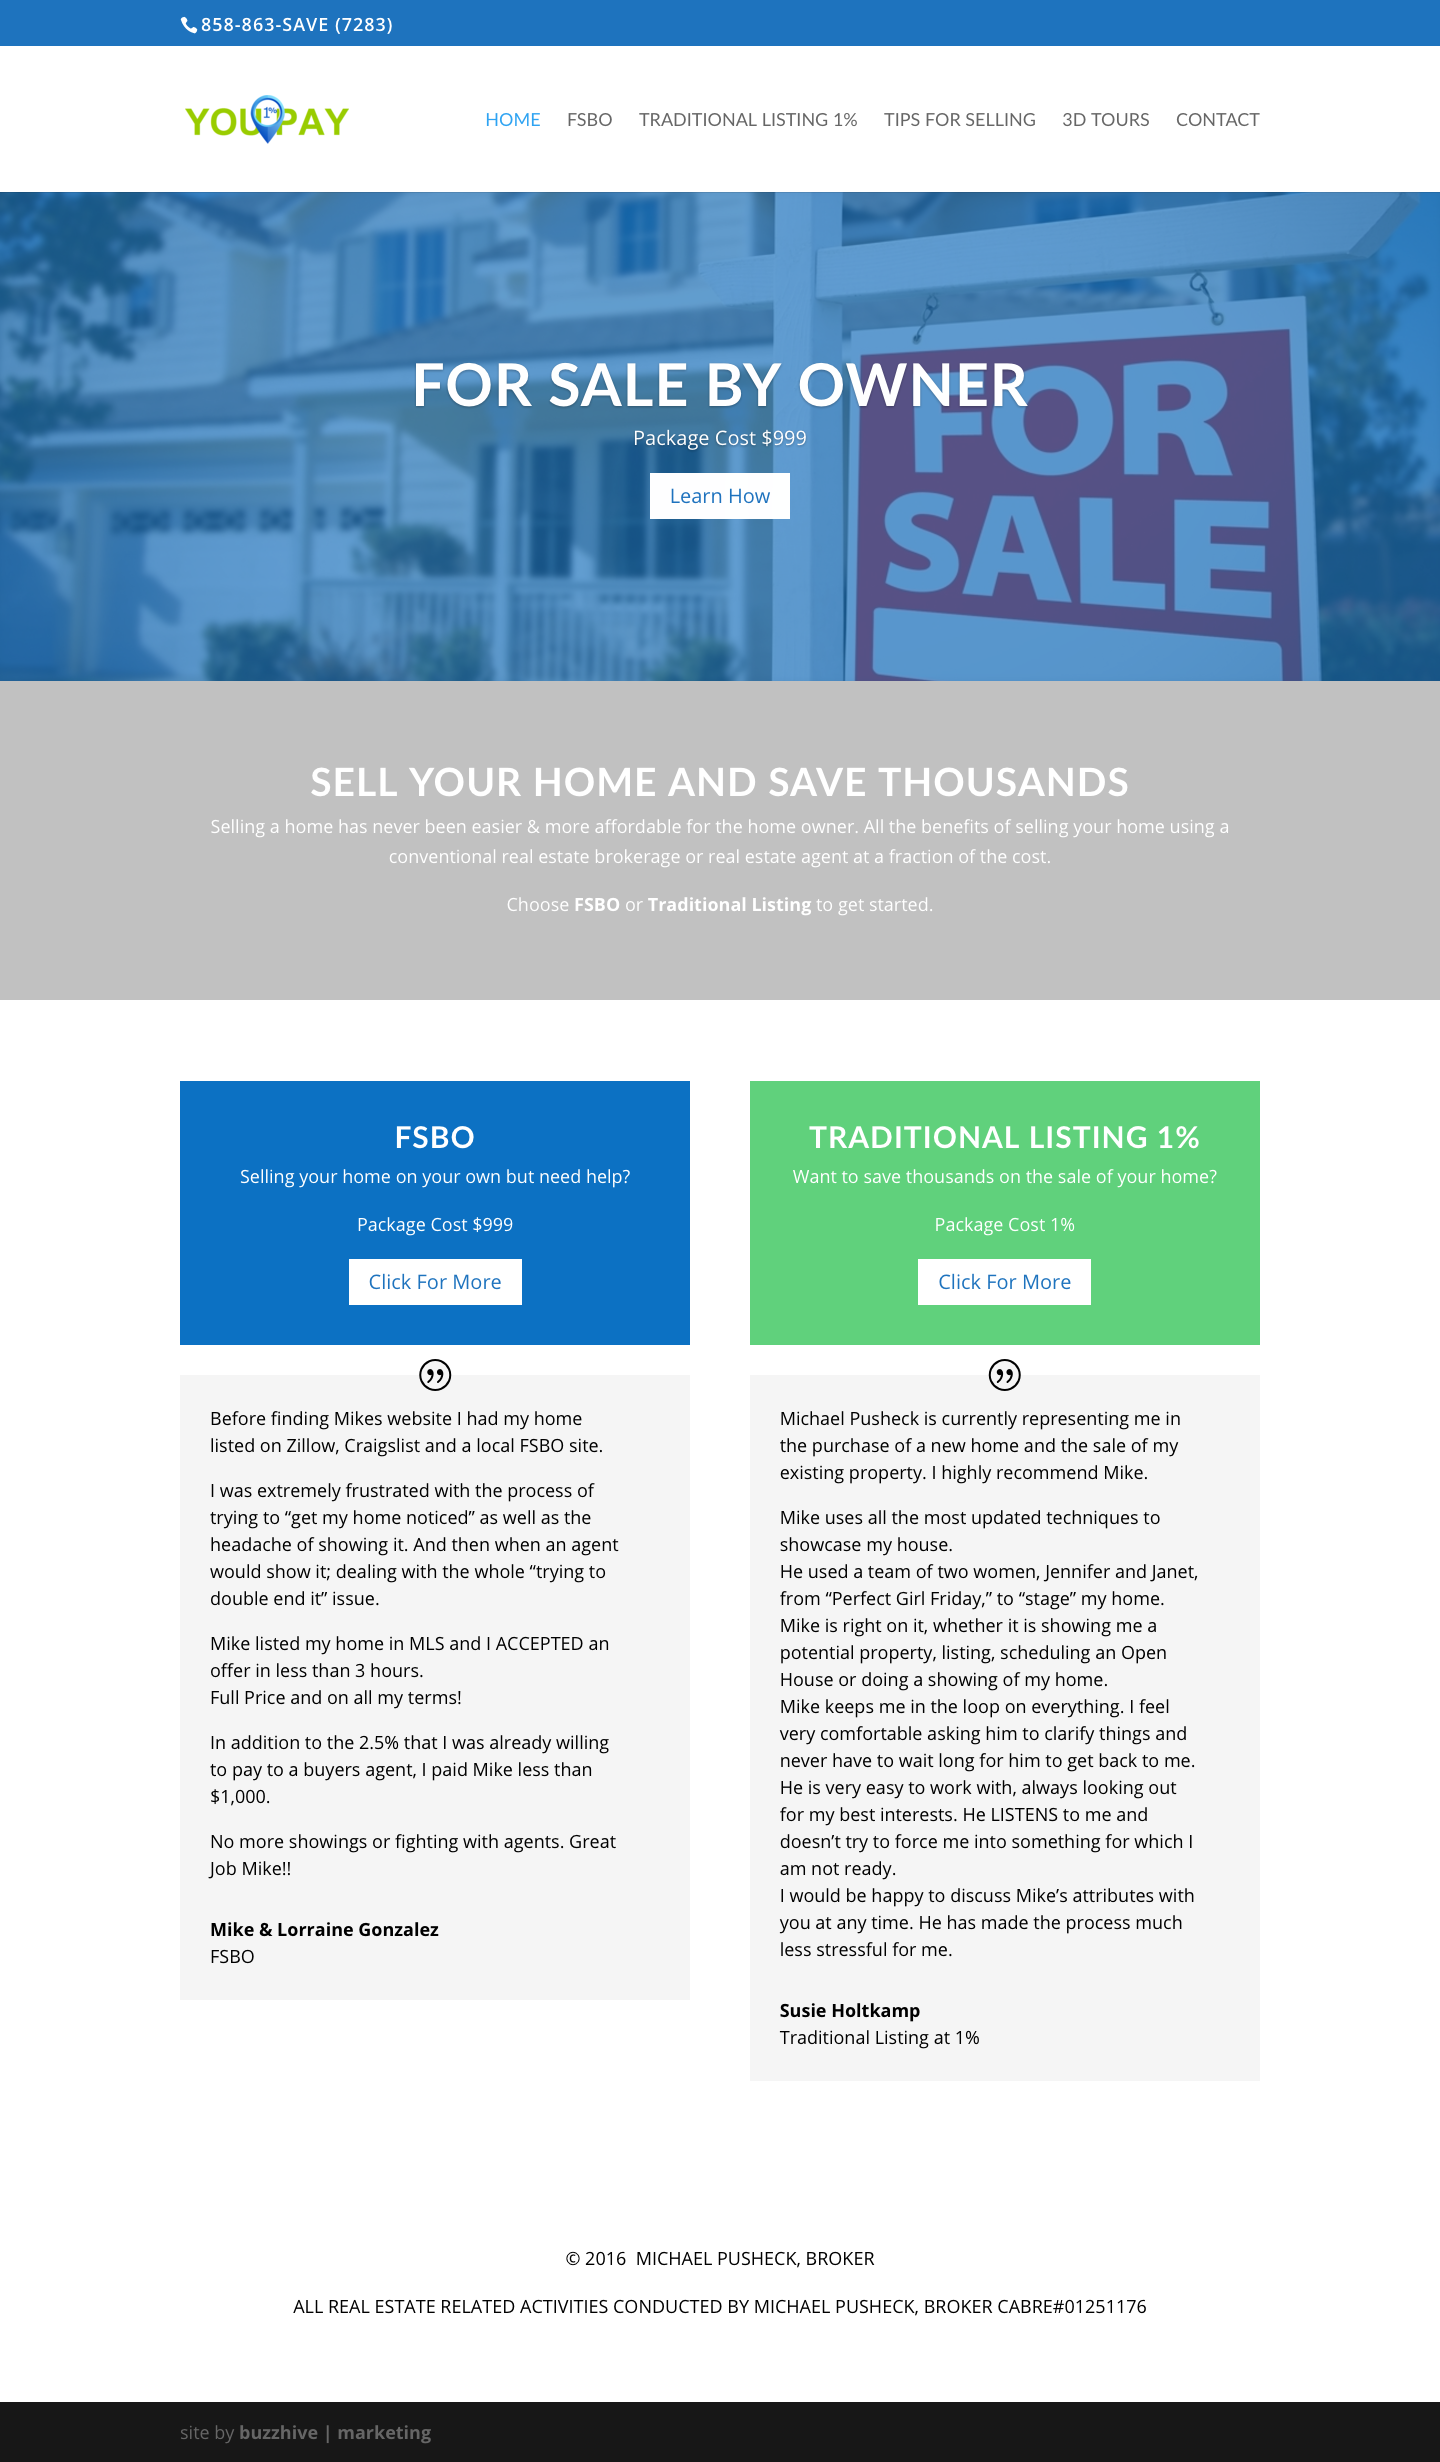 You-Pay-1 Web Design & Development